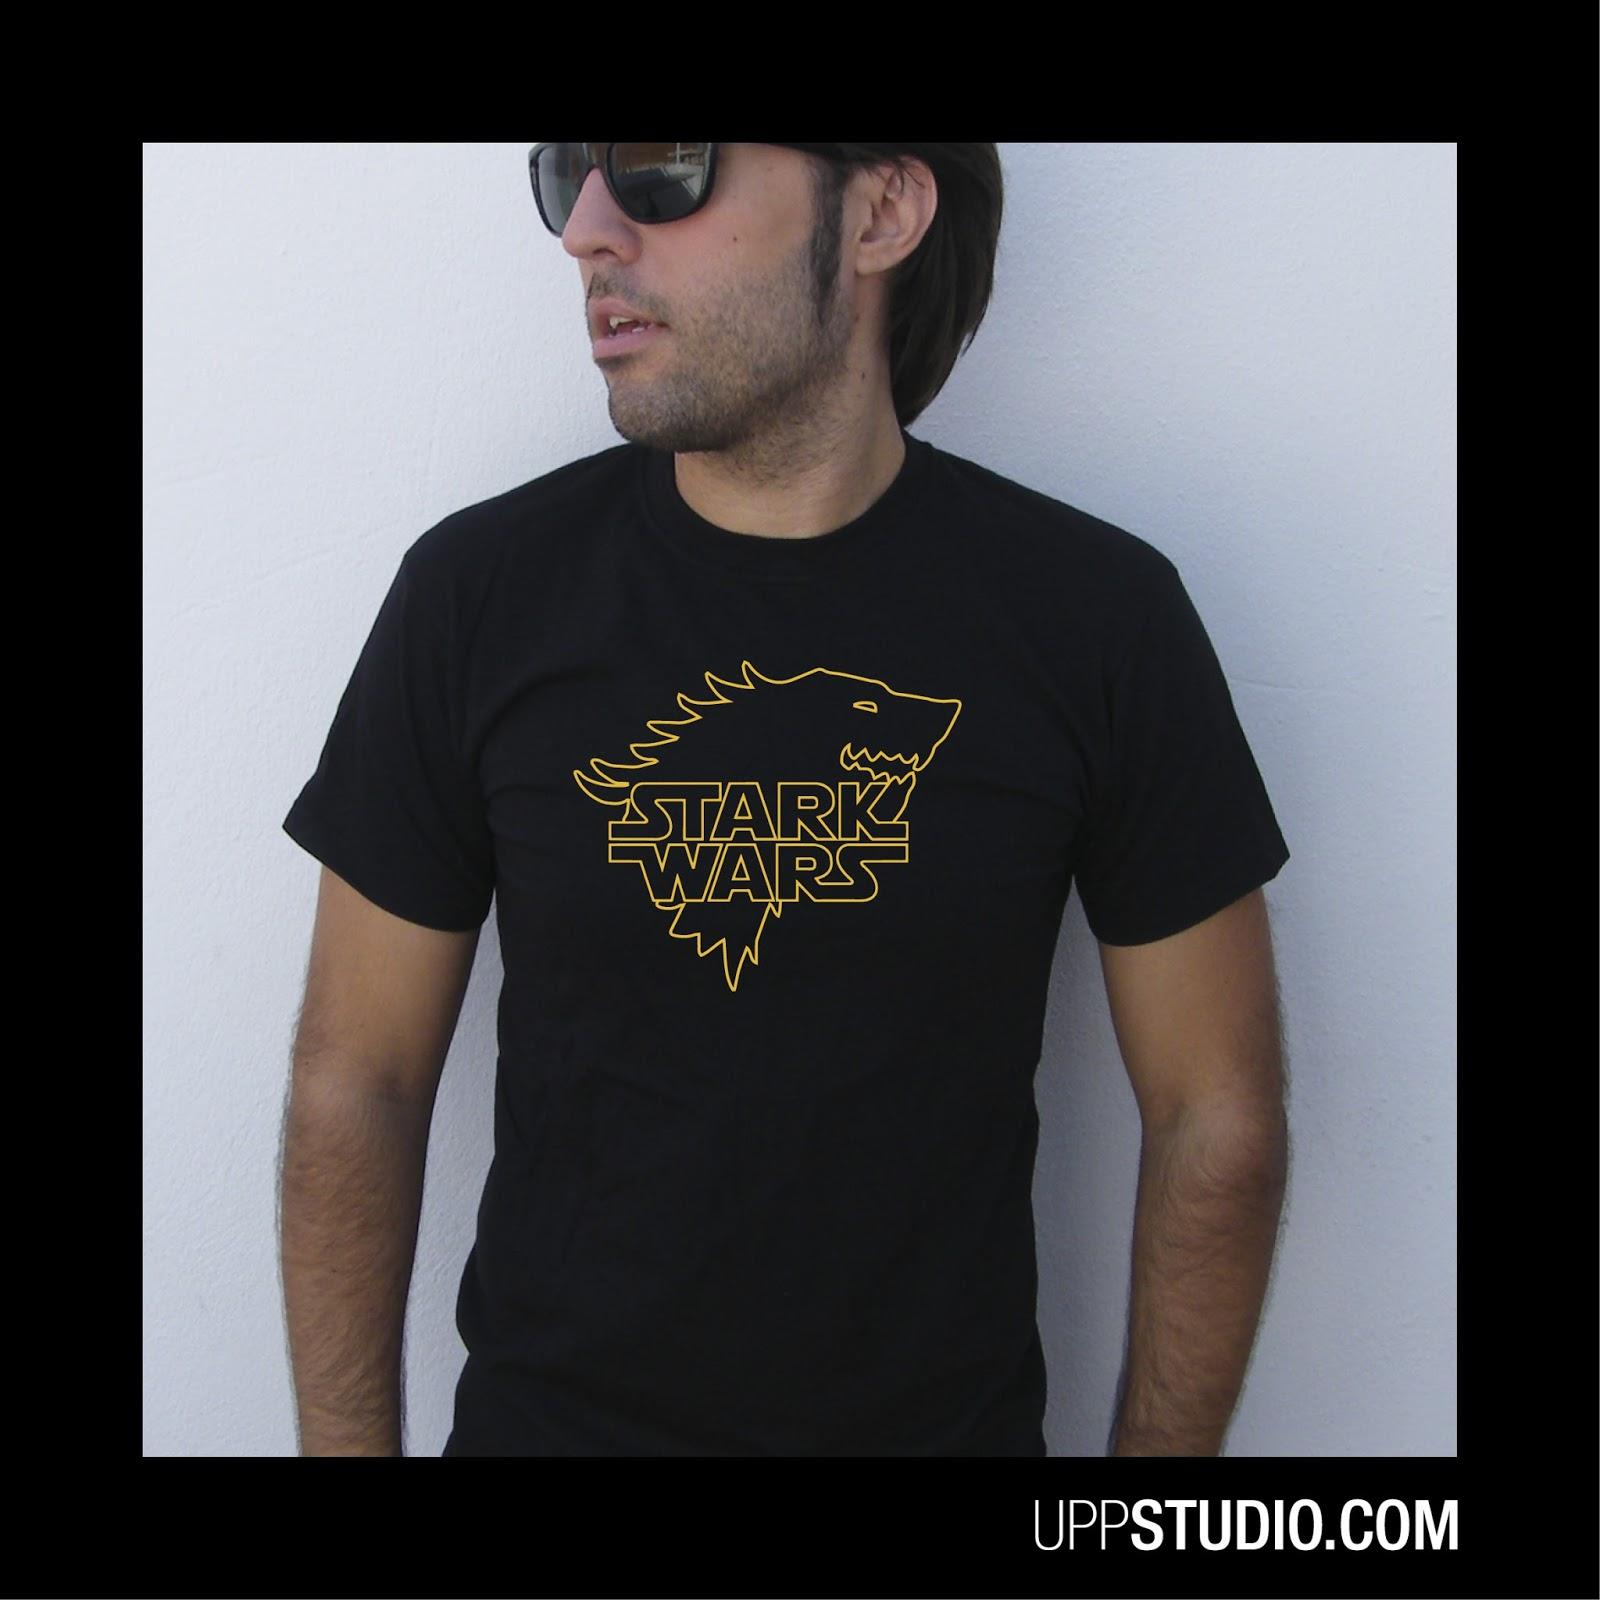 http://www.uppstudio.com/Camiseta-Stark-Wars-Juego-De-Tronos-Star-Wars?utm_source=SPEC&utm_medium=Blog&utm_campaign=GOTSPEC&utm_term=GOTSPEC